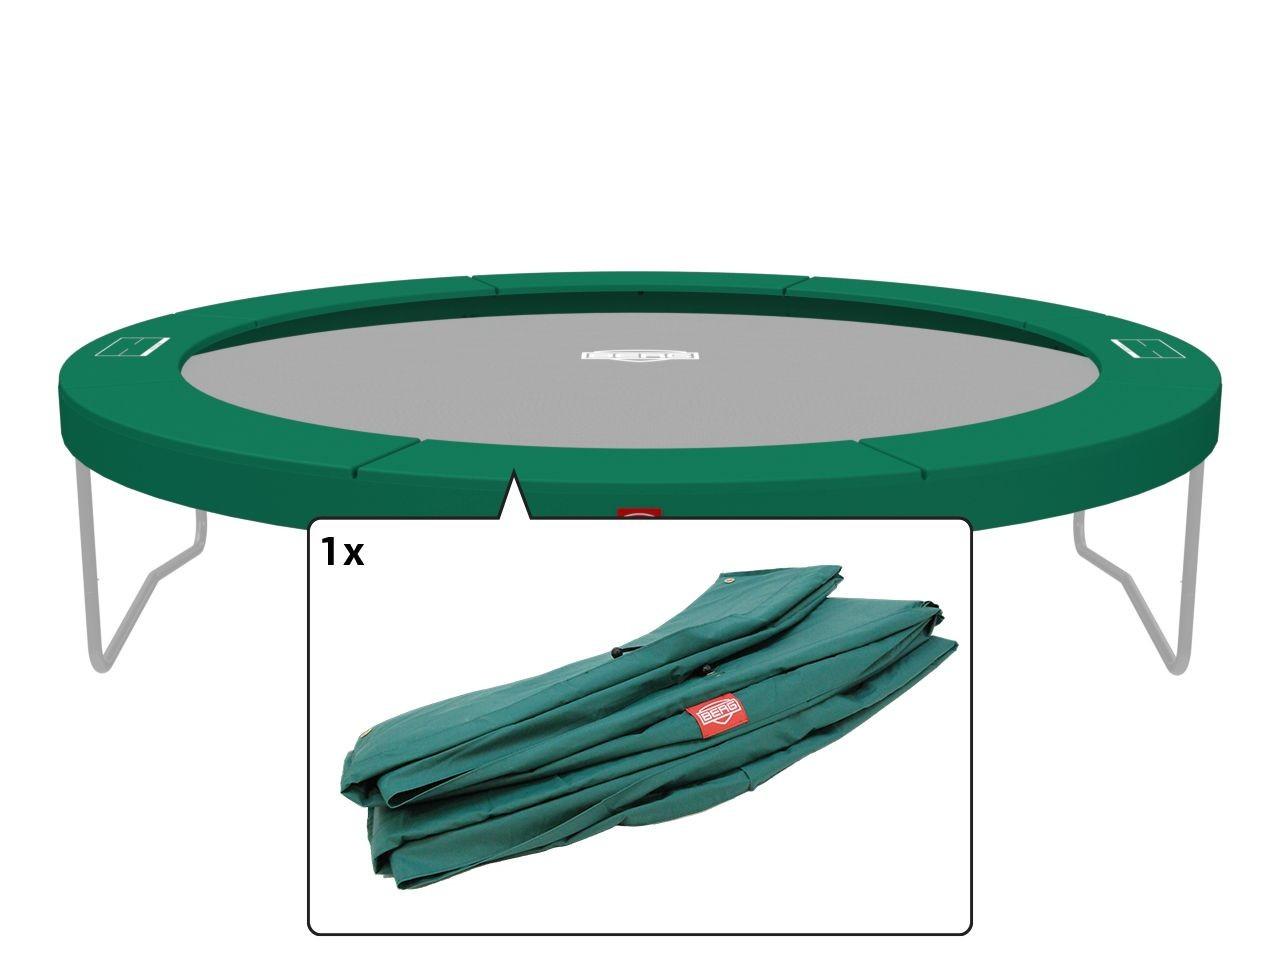 Champion - Padding green 430 (14ft)